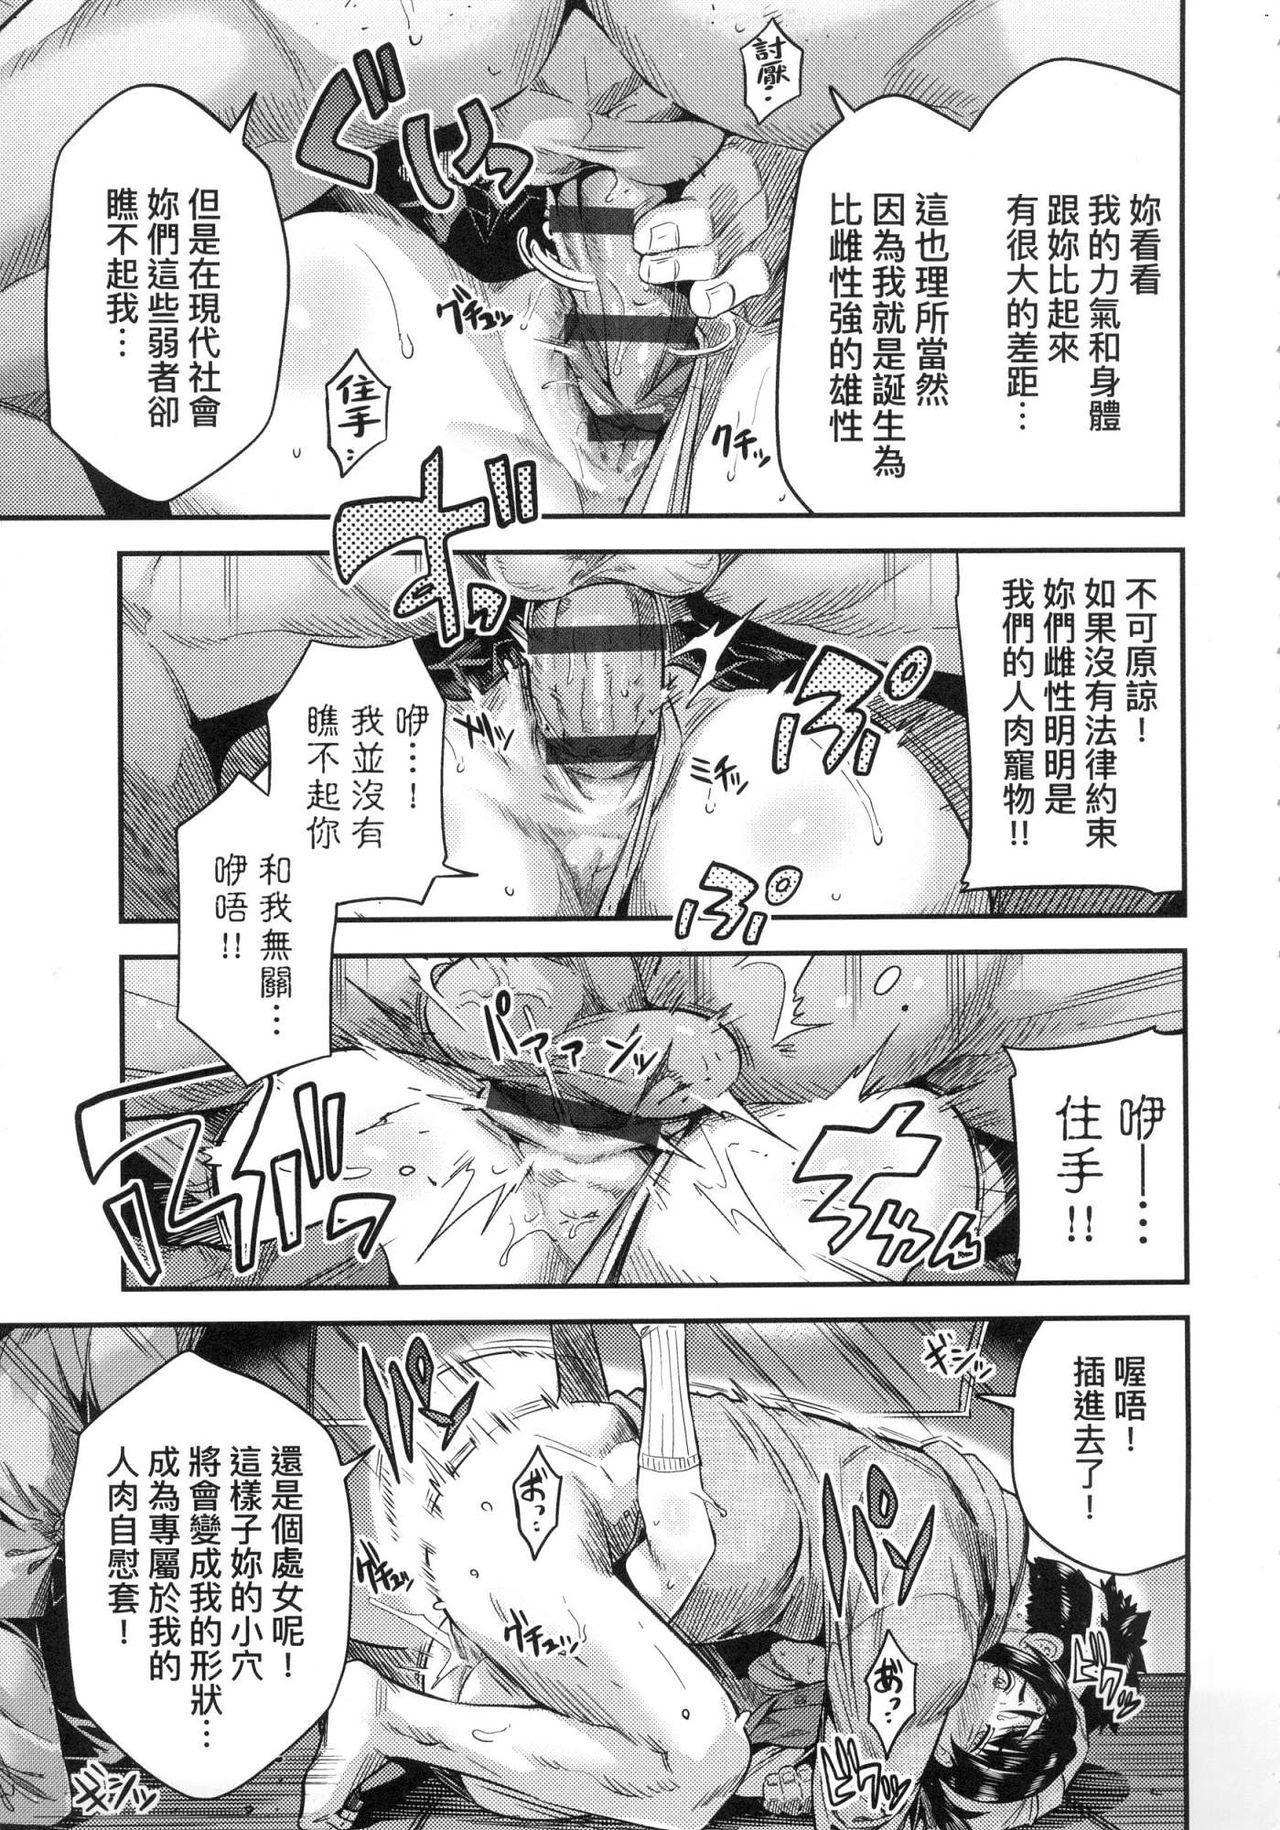 Kyousei Tanetsuke Express - Forced Seeding Express 76